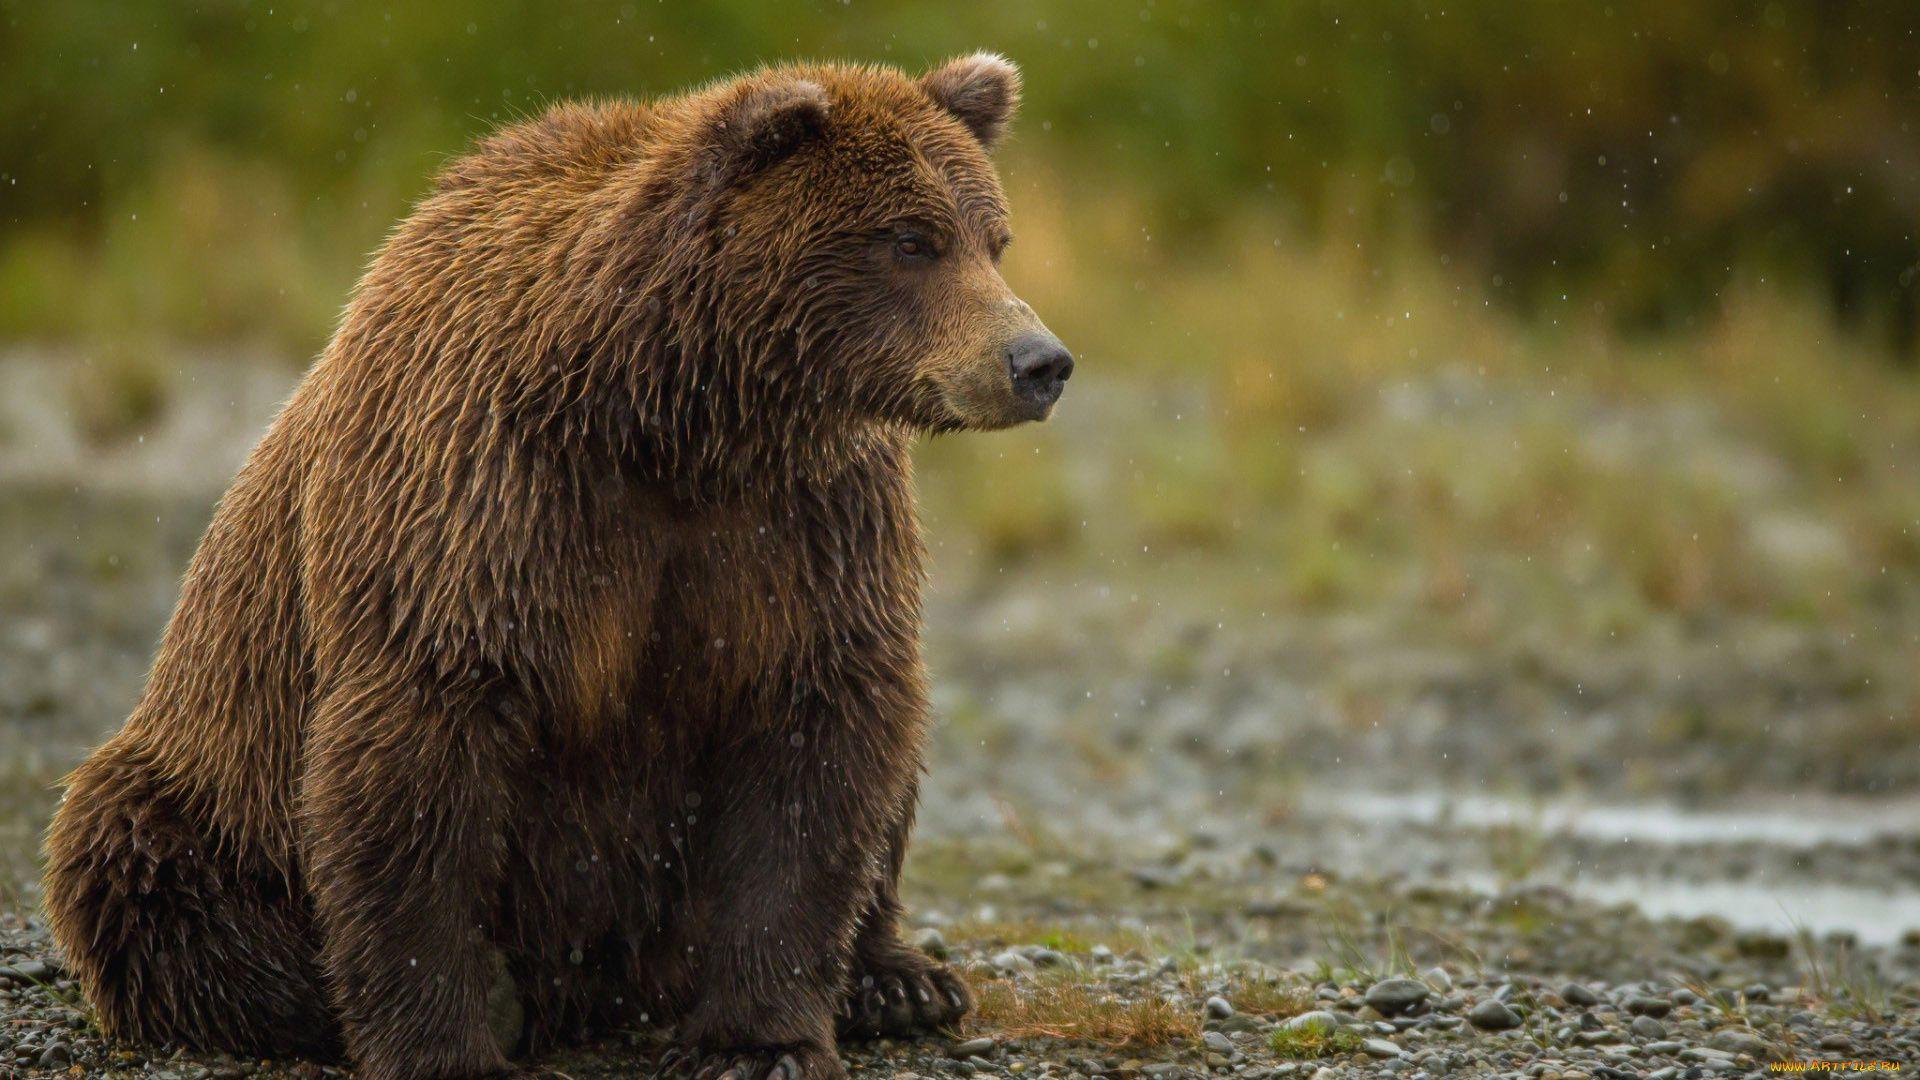 Brown Bear Side View